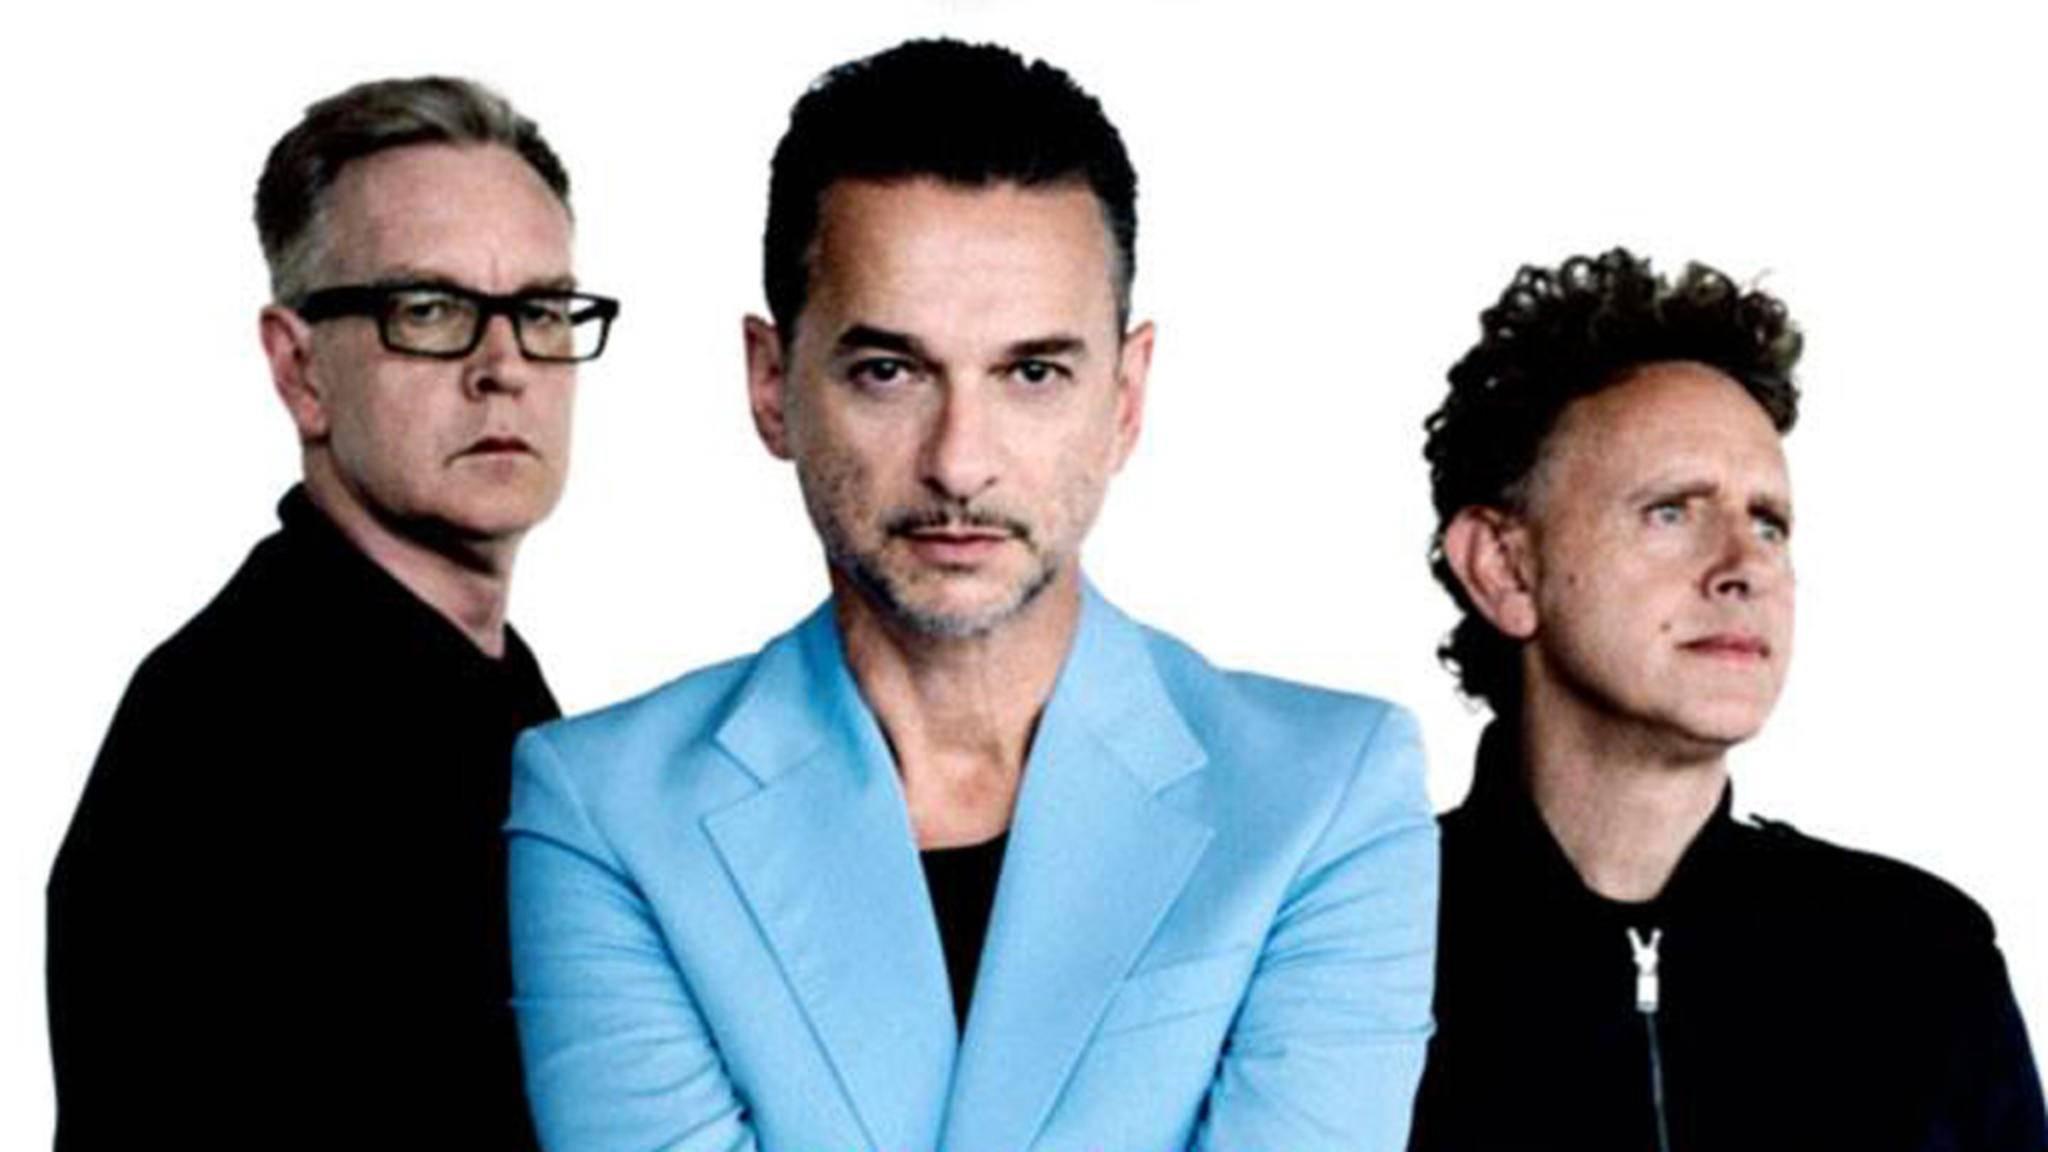 Neues Album, große Tour: Depeche Mode haben 2017 Großes vor.